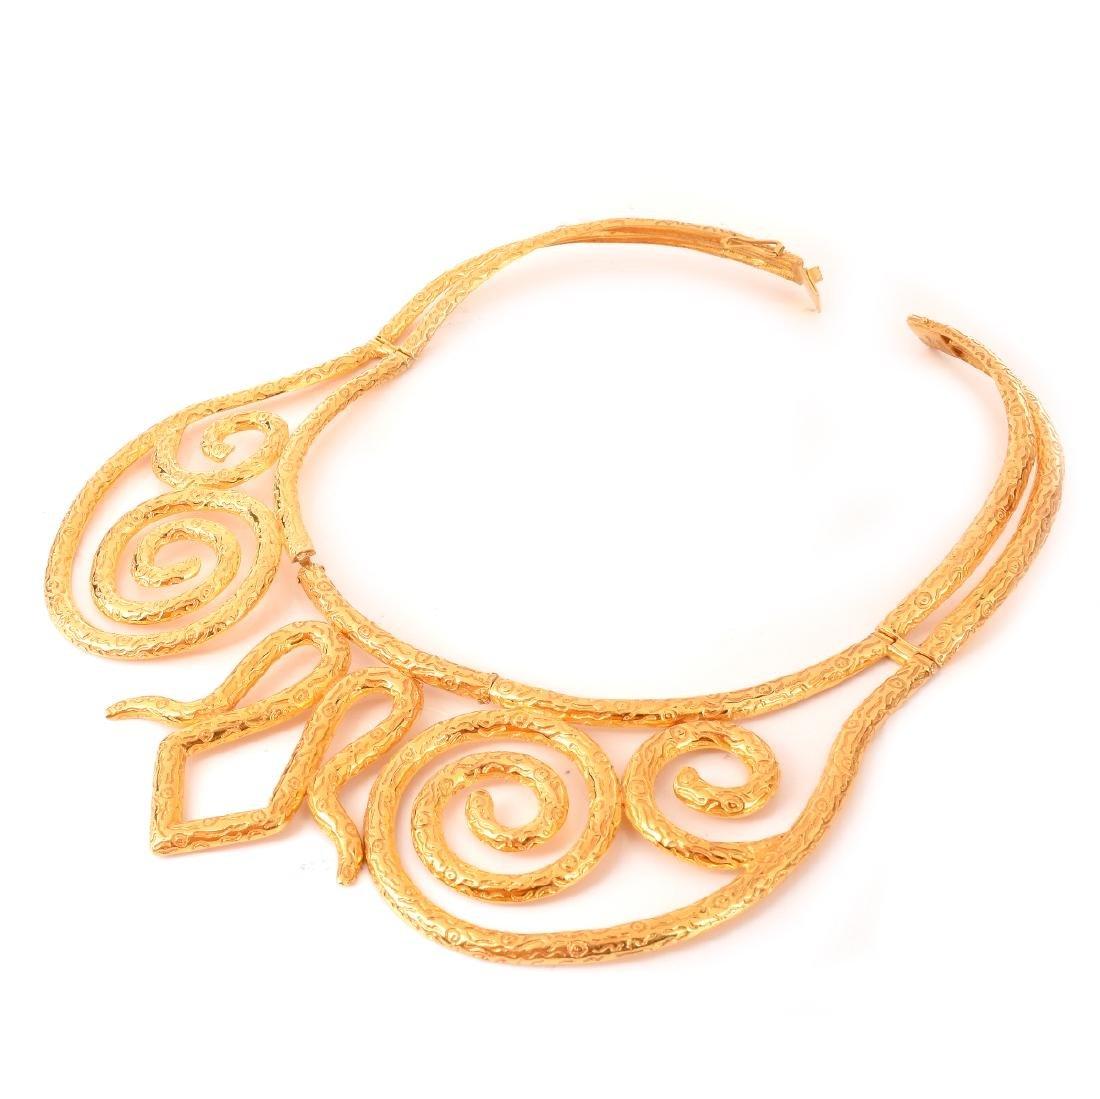 Vintage 22 Karat Yellow Gold Necklace